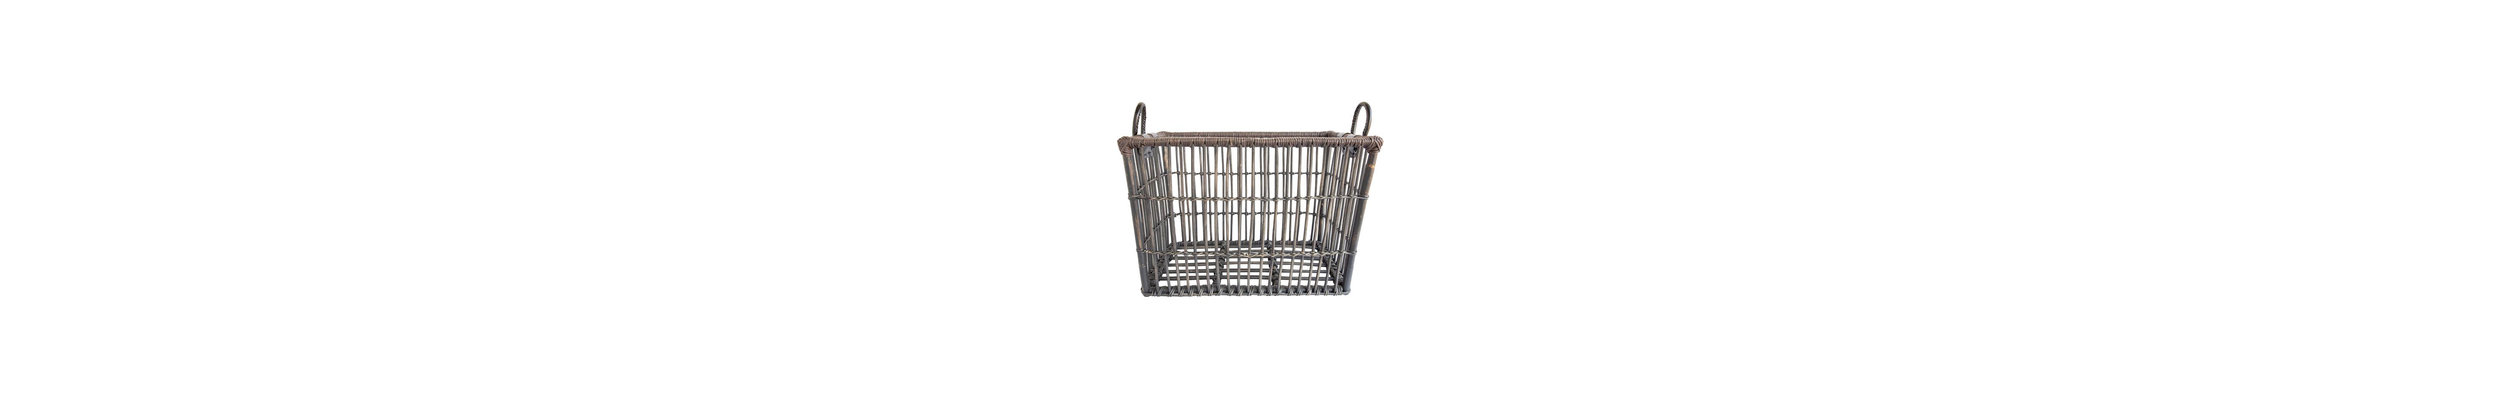 Nesting_Wicker_Baskets_4_960x960.jpg